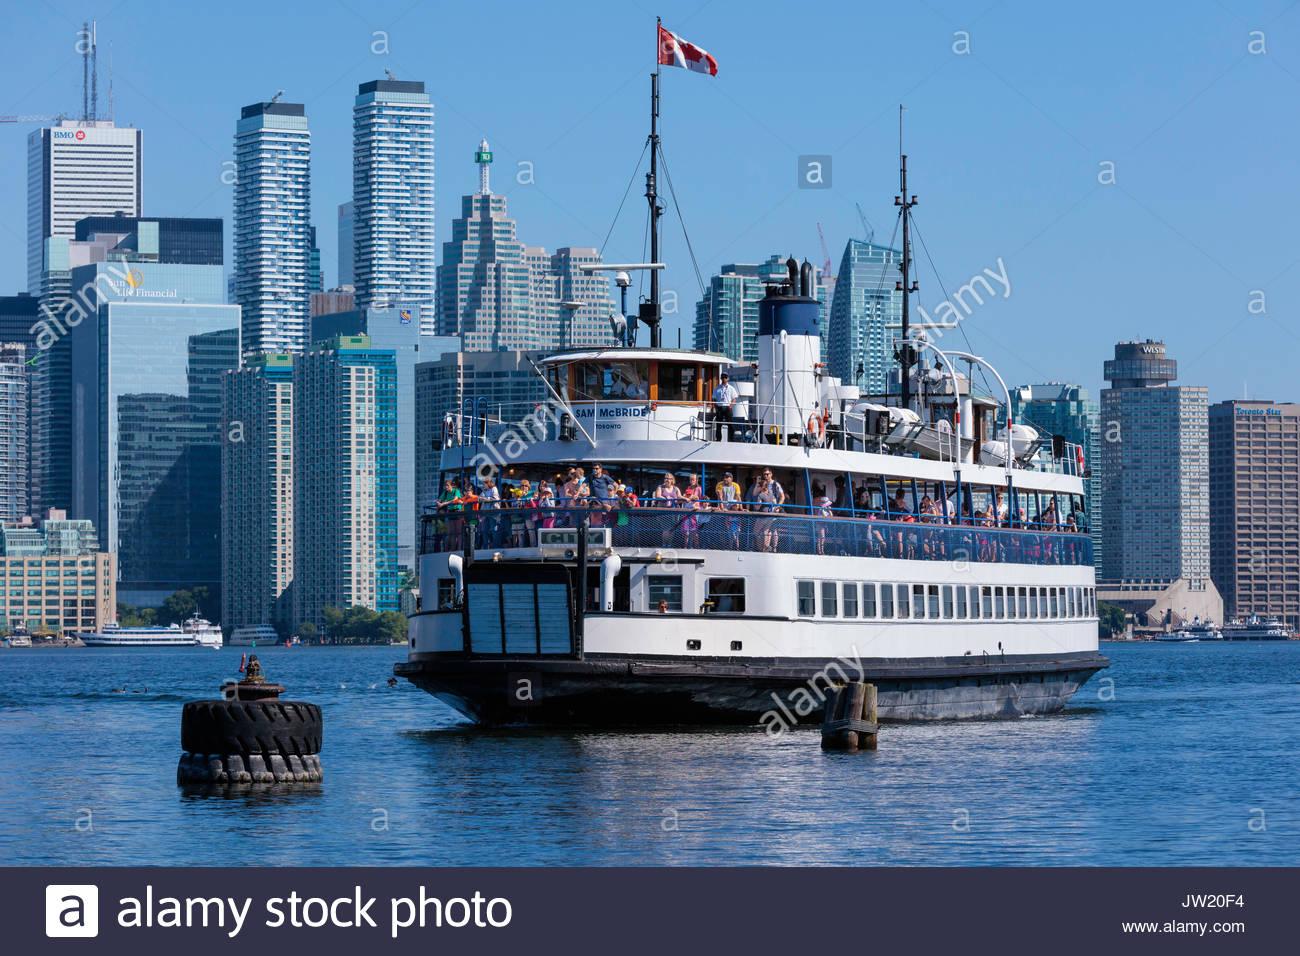 Arrivant par ferry-boat les îles de Toronto Skyline Park Toronto cityscape Waterfront Toronto Ontario Canada Photo Stock